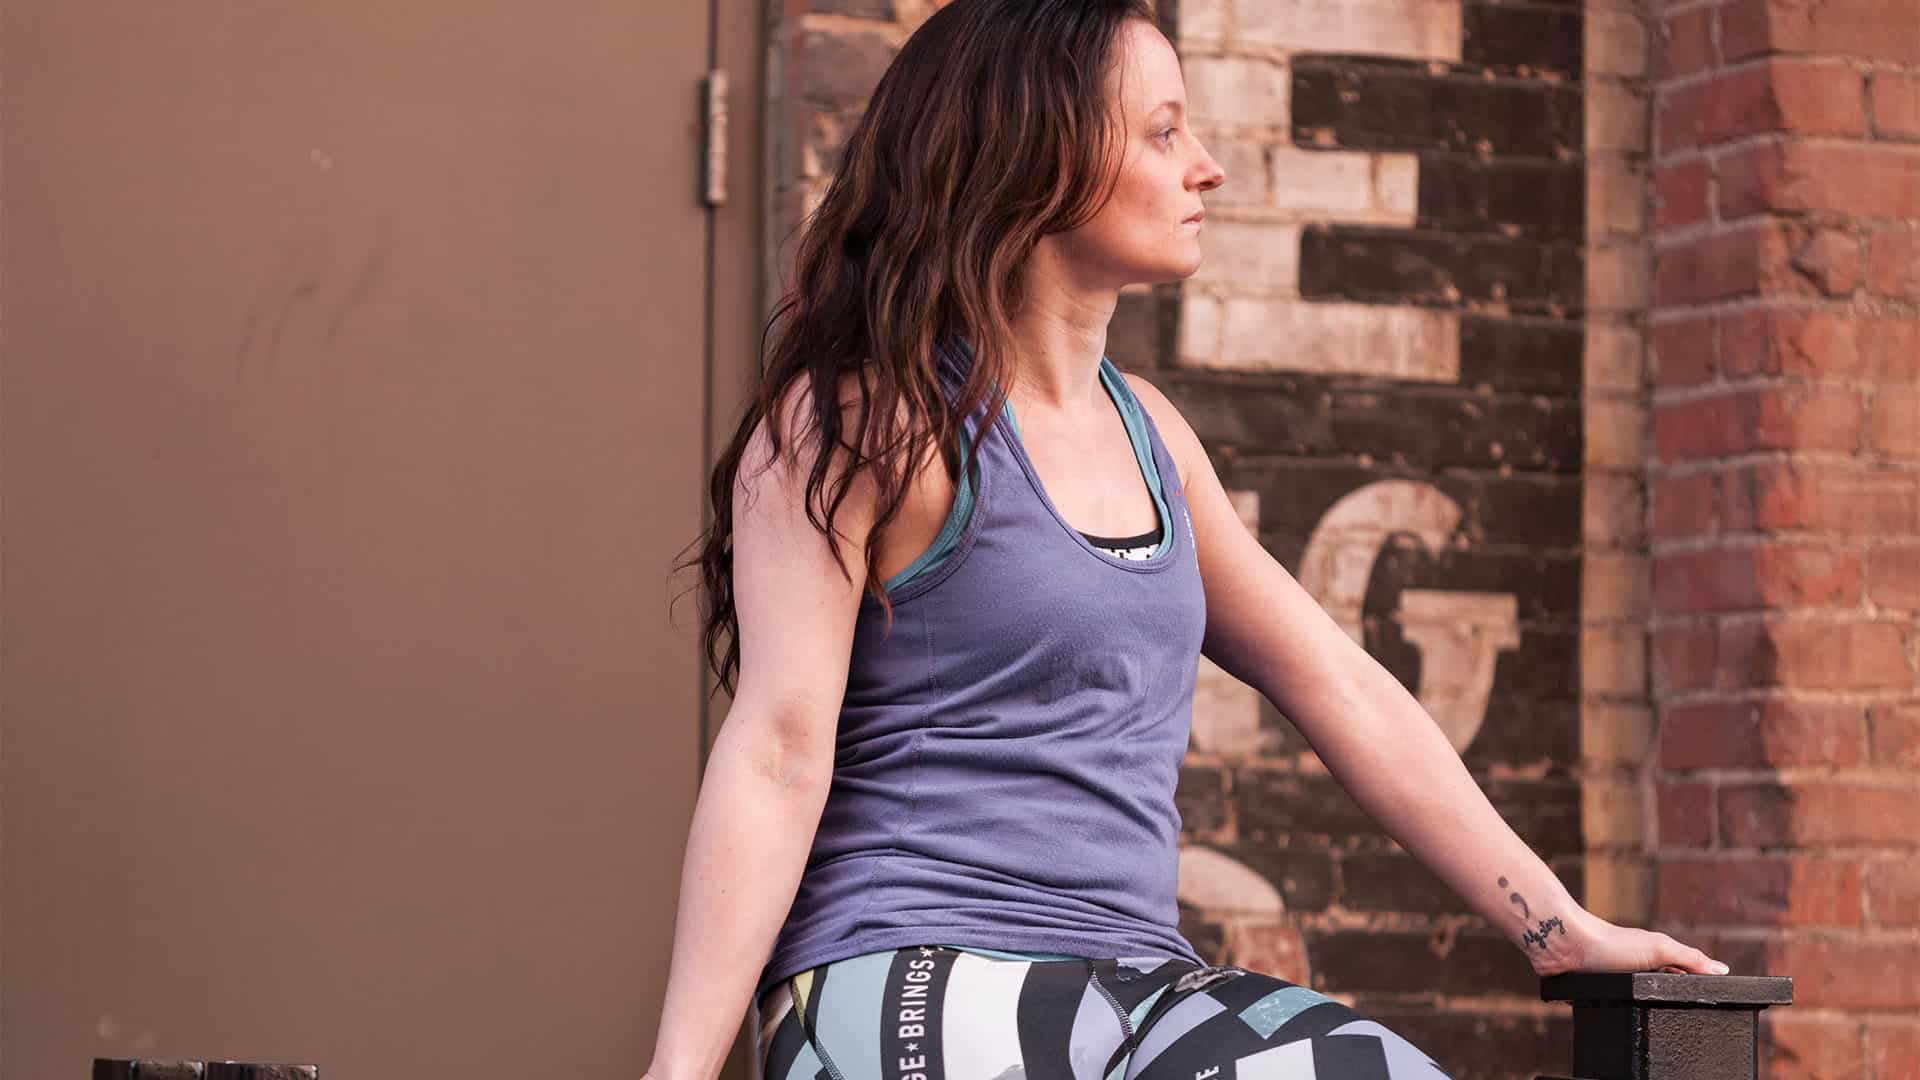 Summer Sides Fitness - Being a Beginner